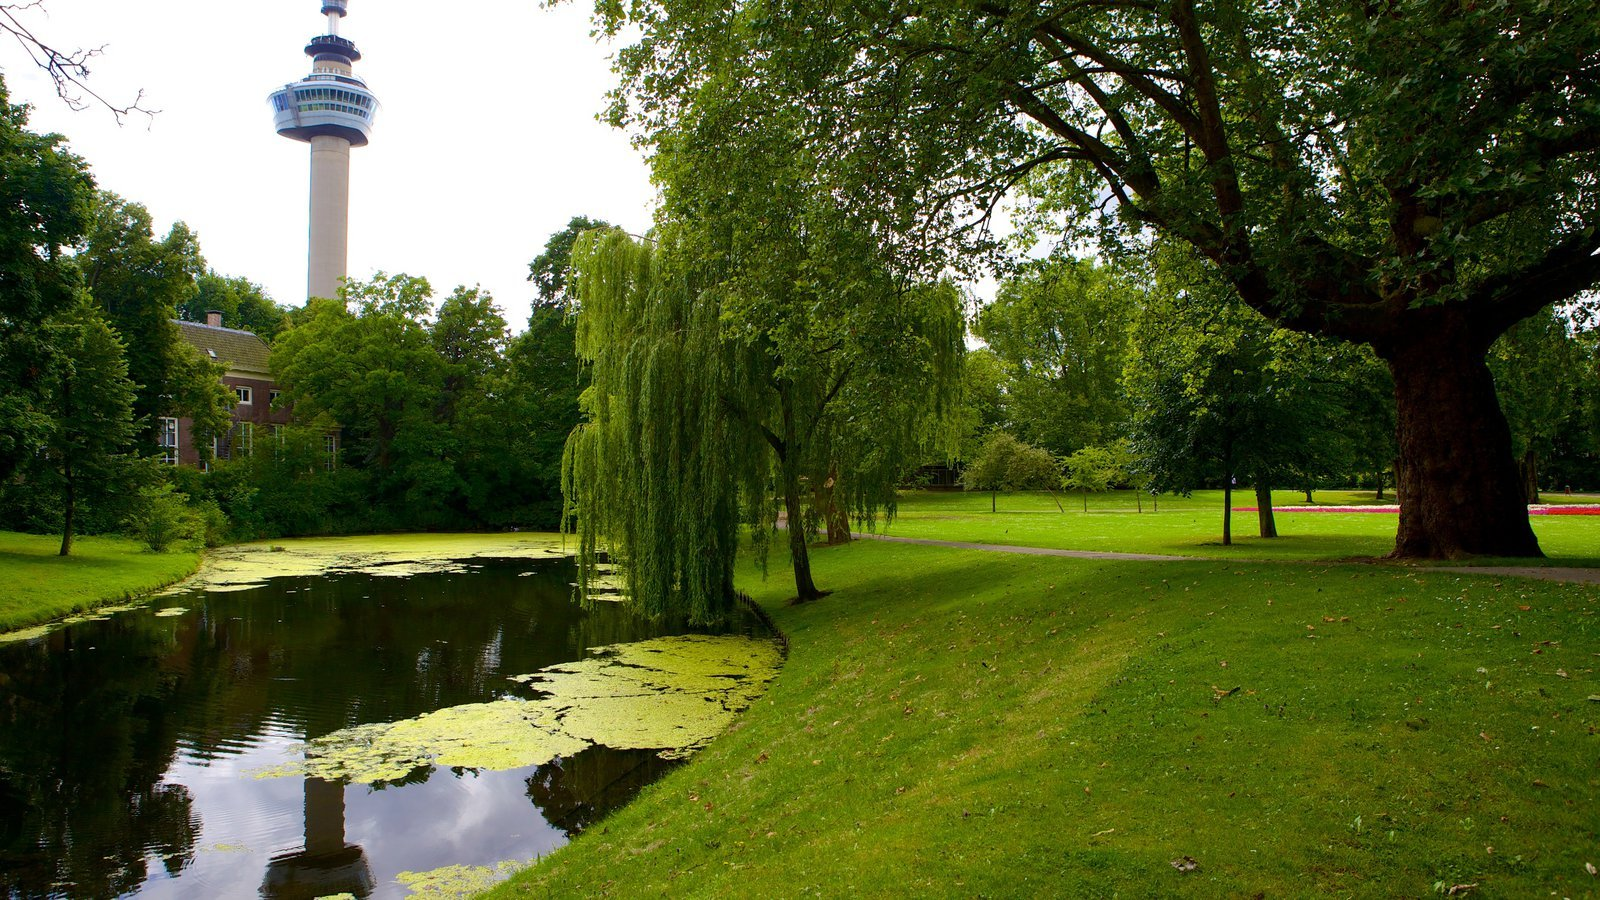 Обои лето, Облака, Дирксланд, нидерланды. Пейзажи foto 19